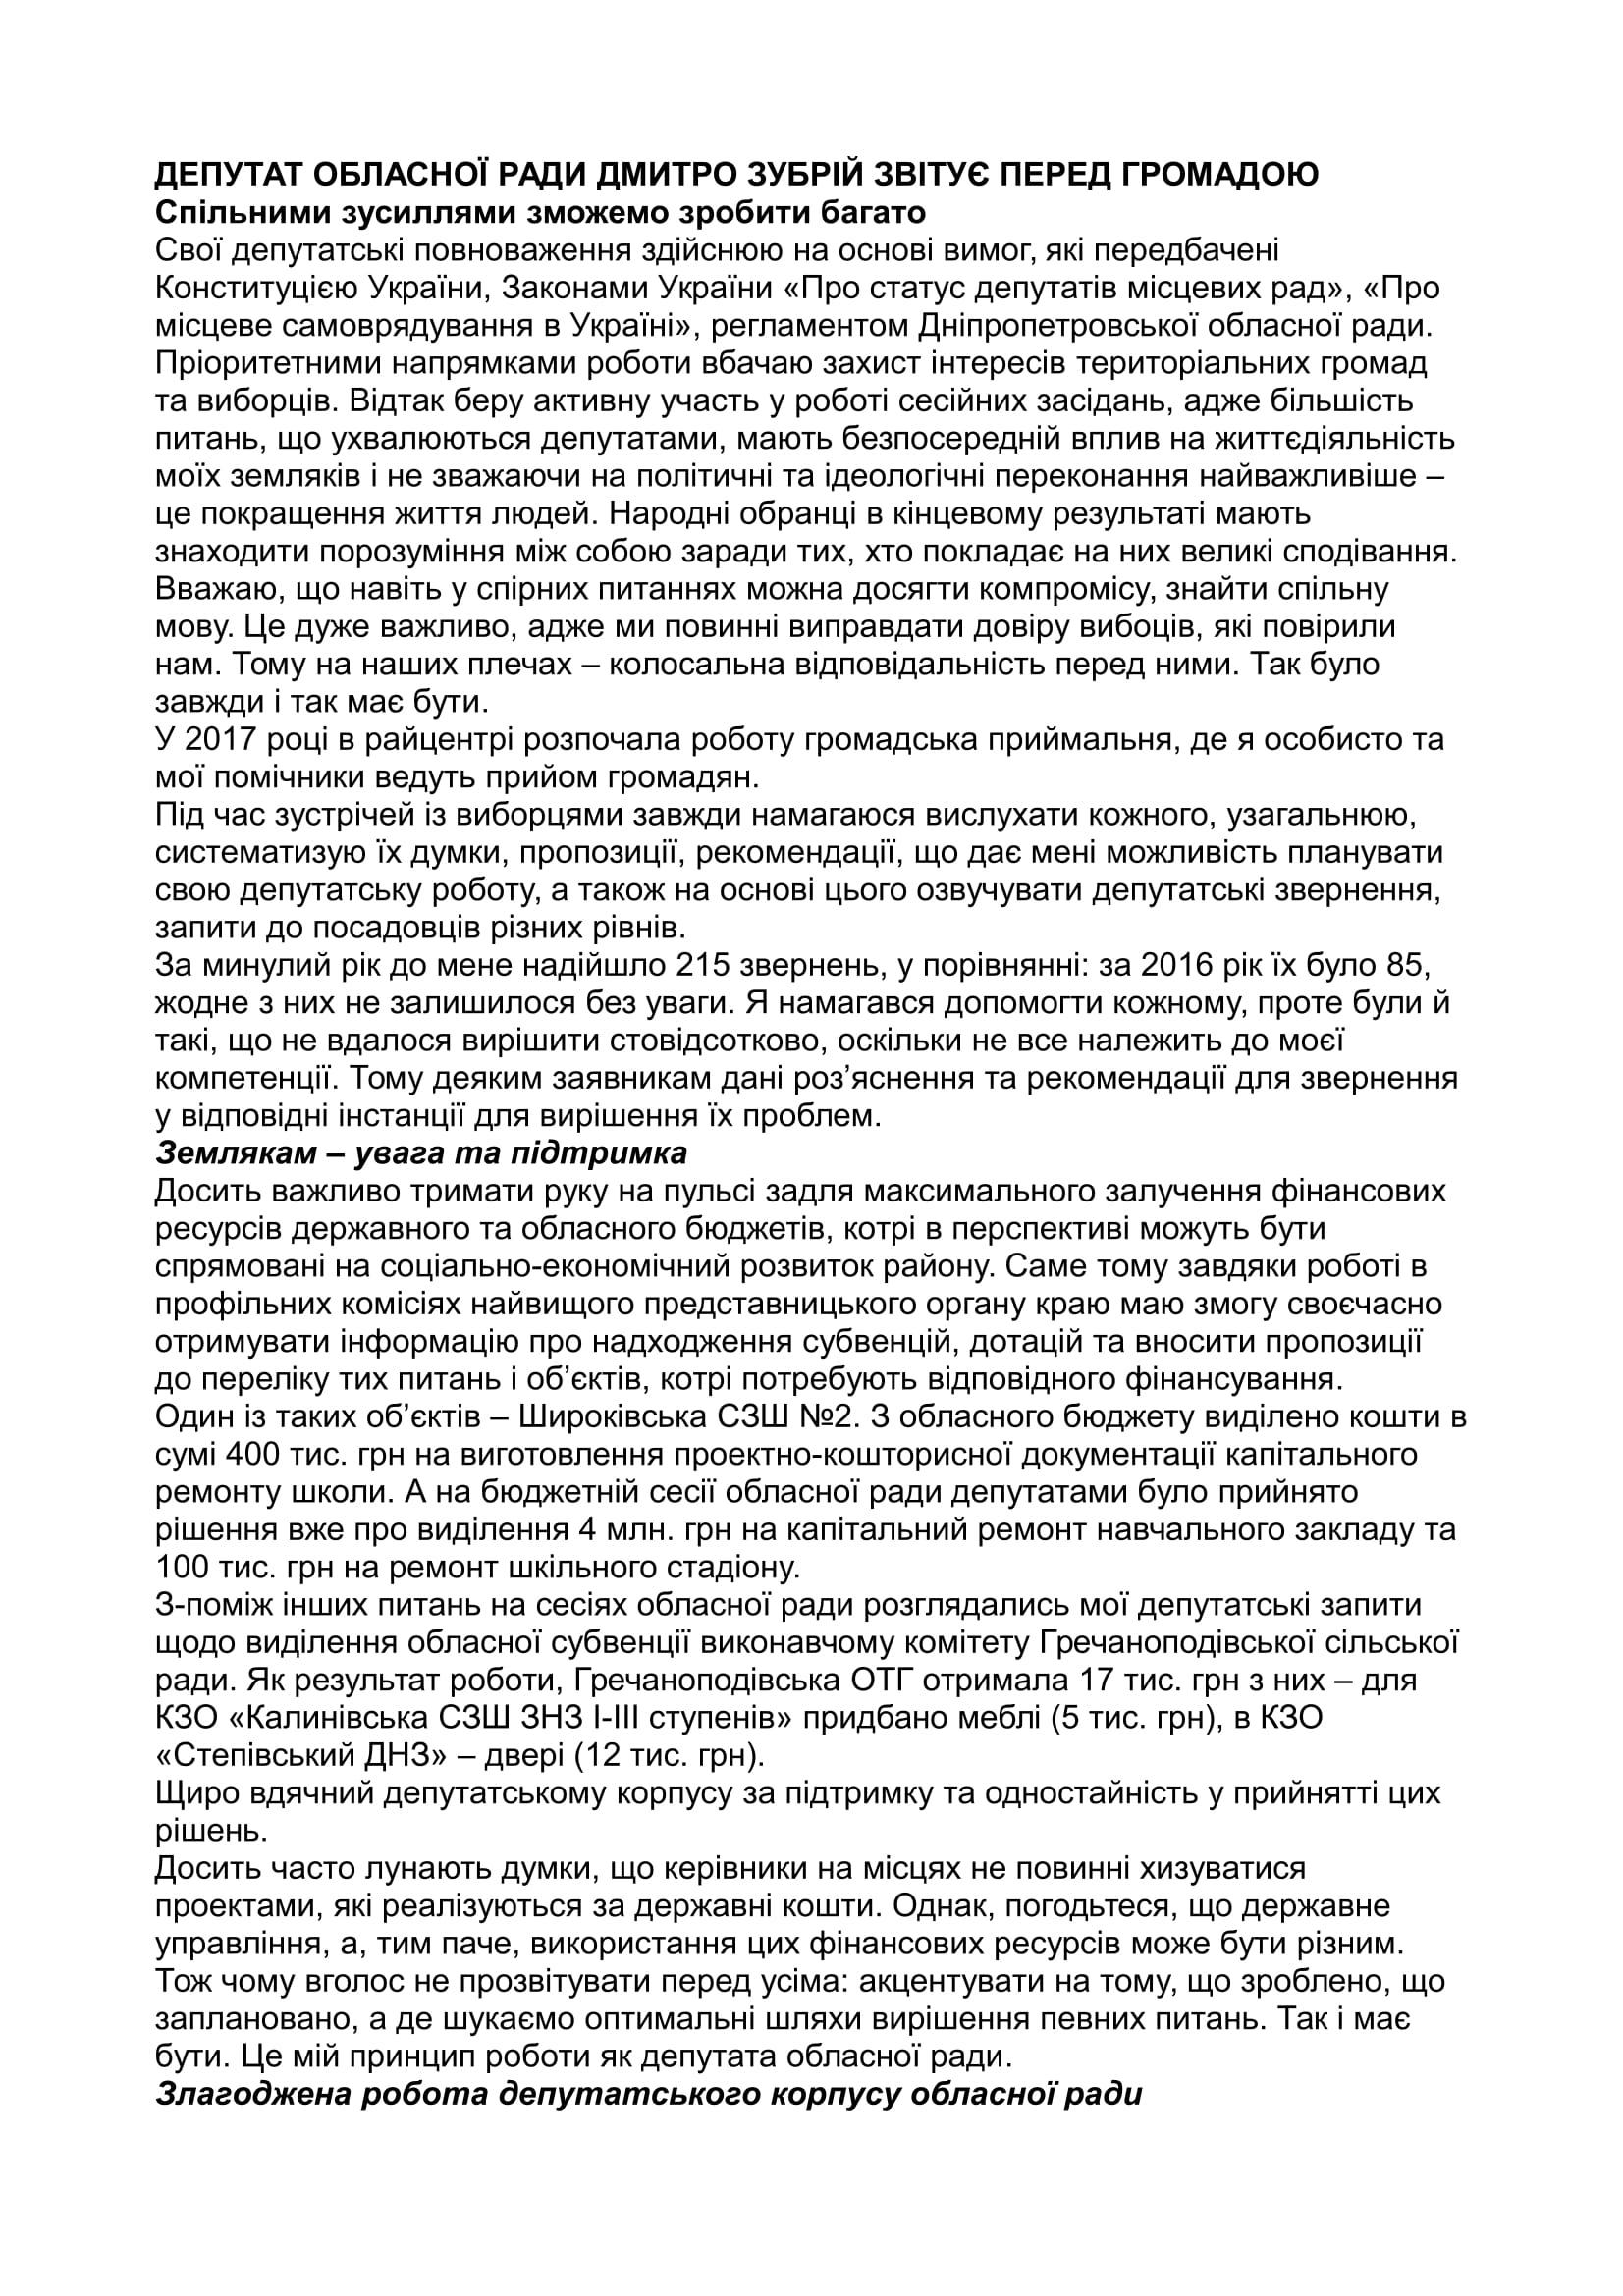 ДЕПУТАТ ОБЛАСНОЇ РАДИ Зубрий-1